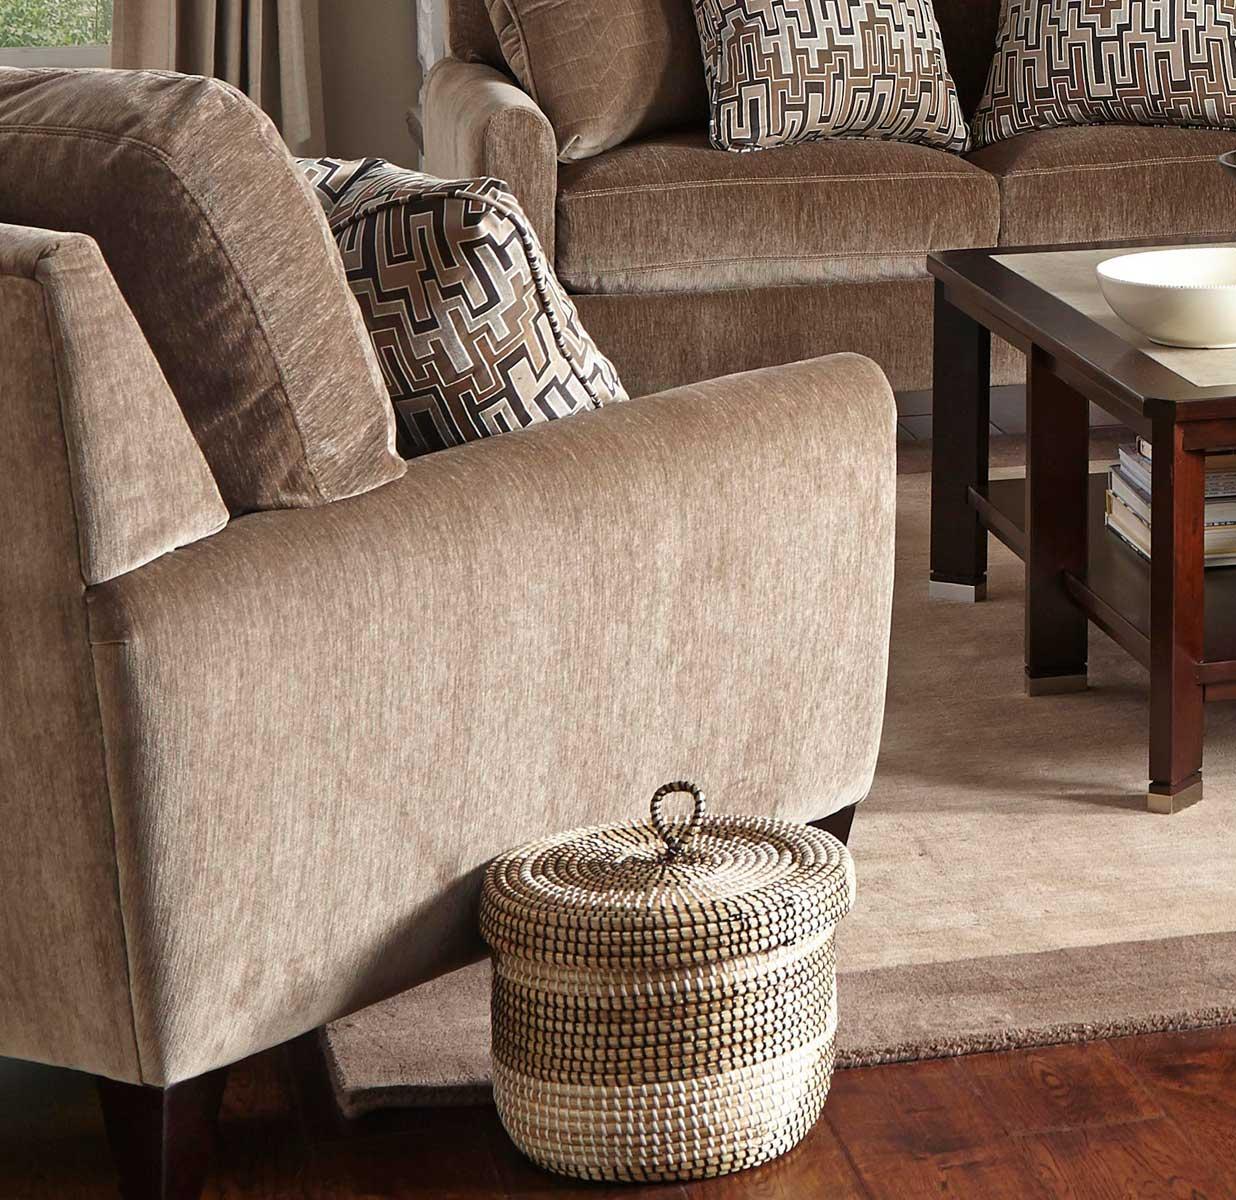 Jackson Mulholland Chair - Taupe